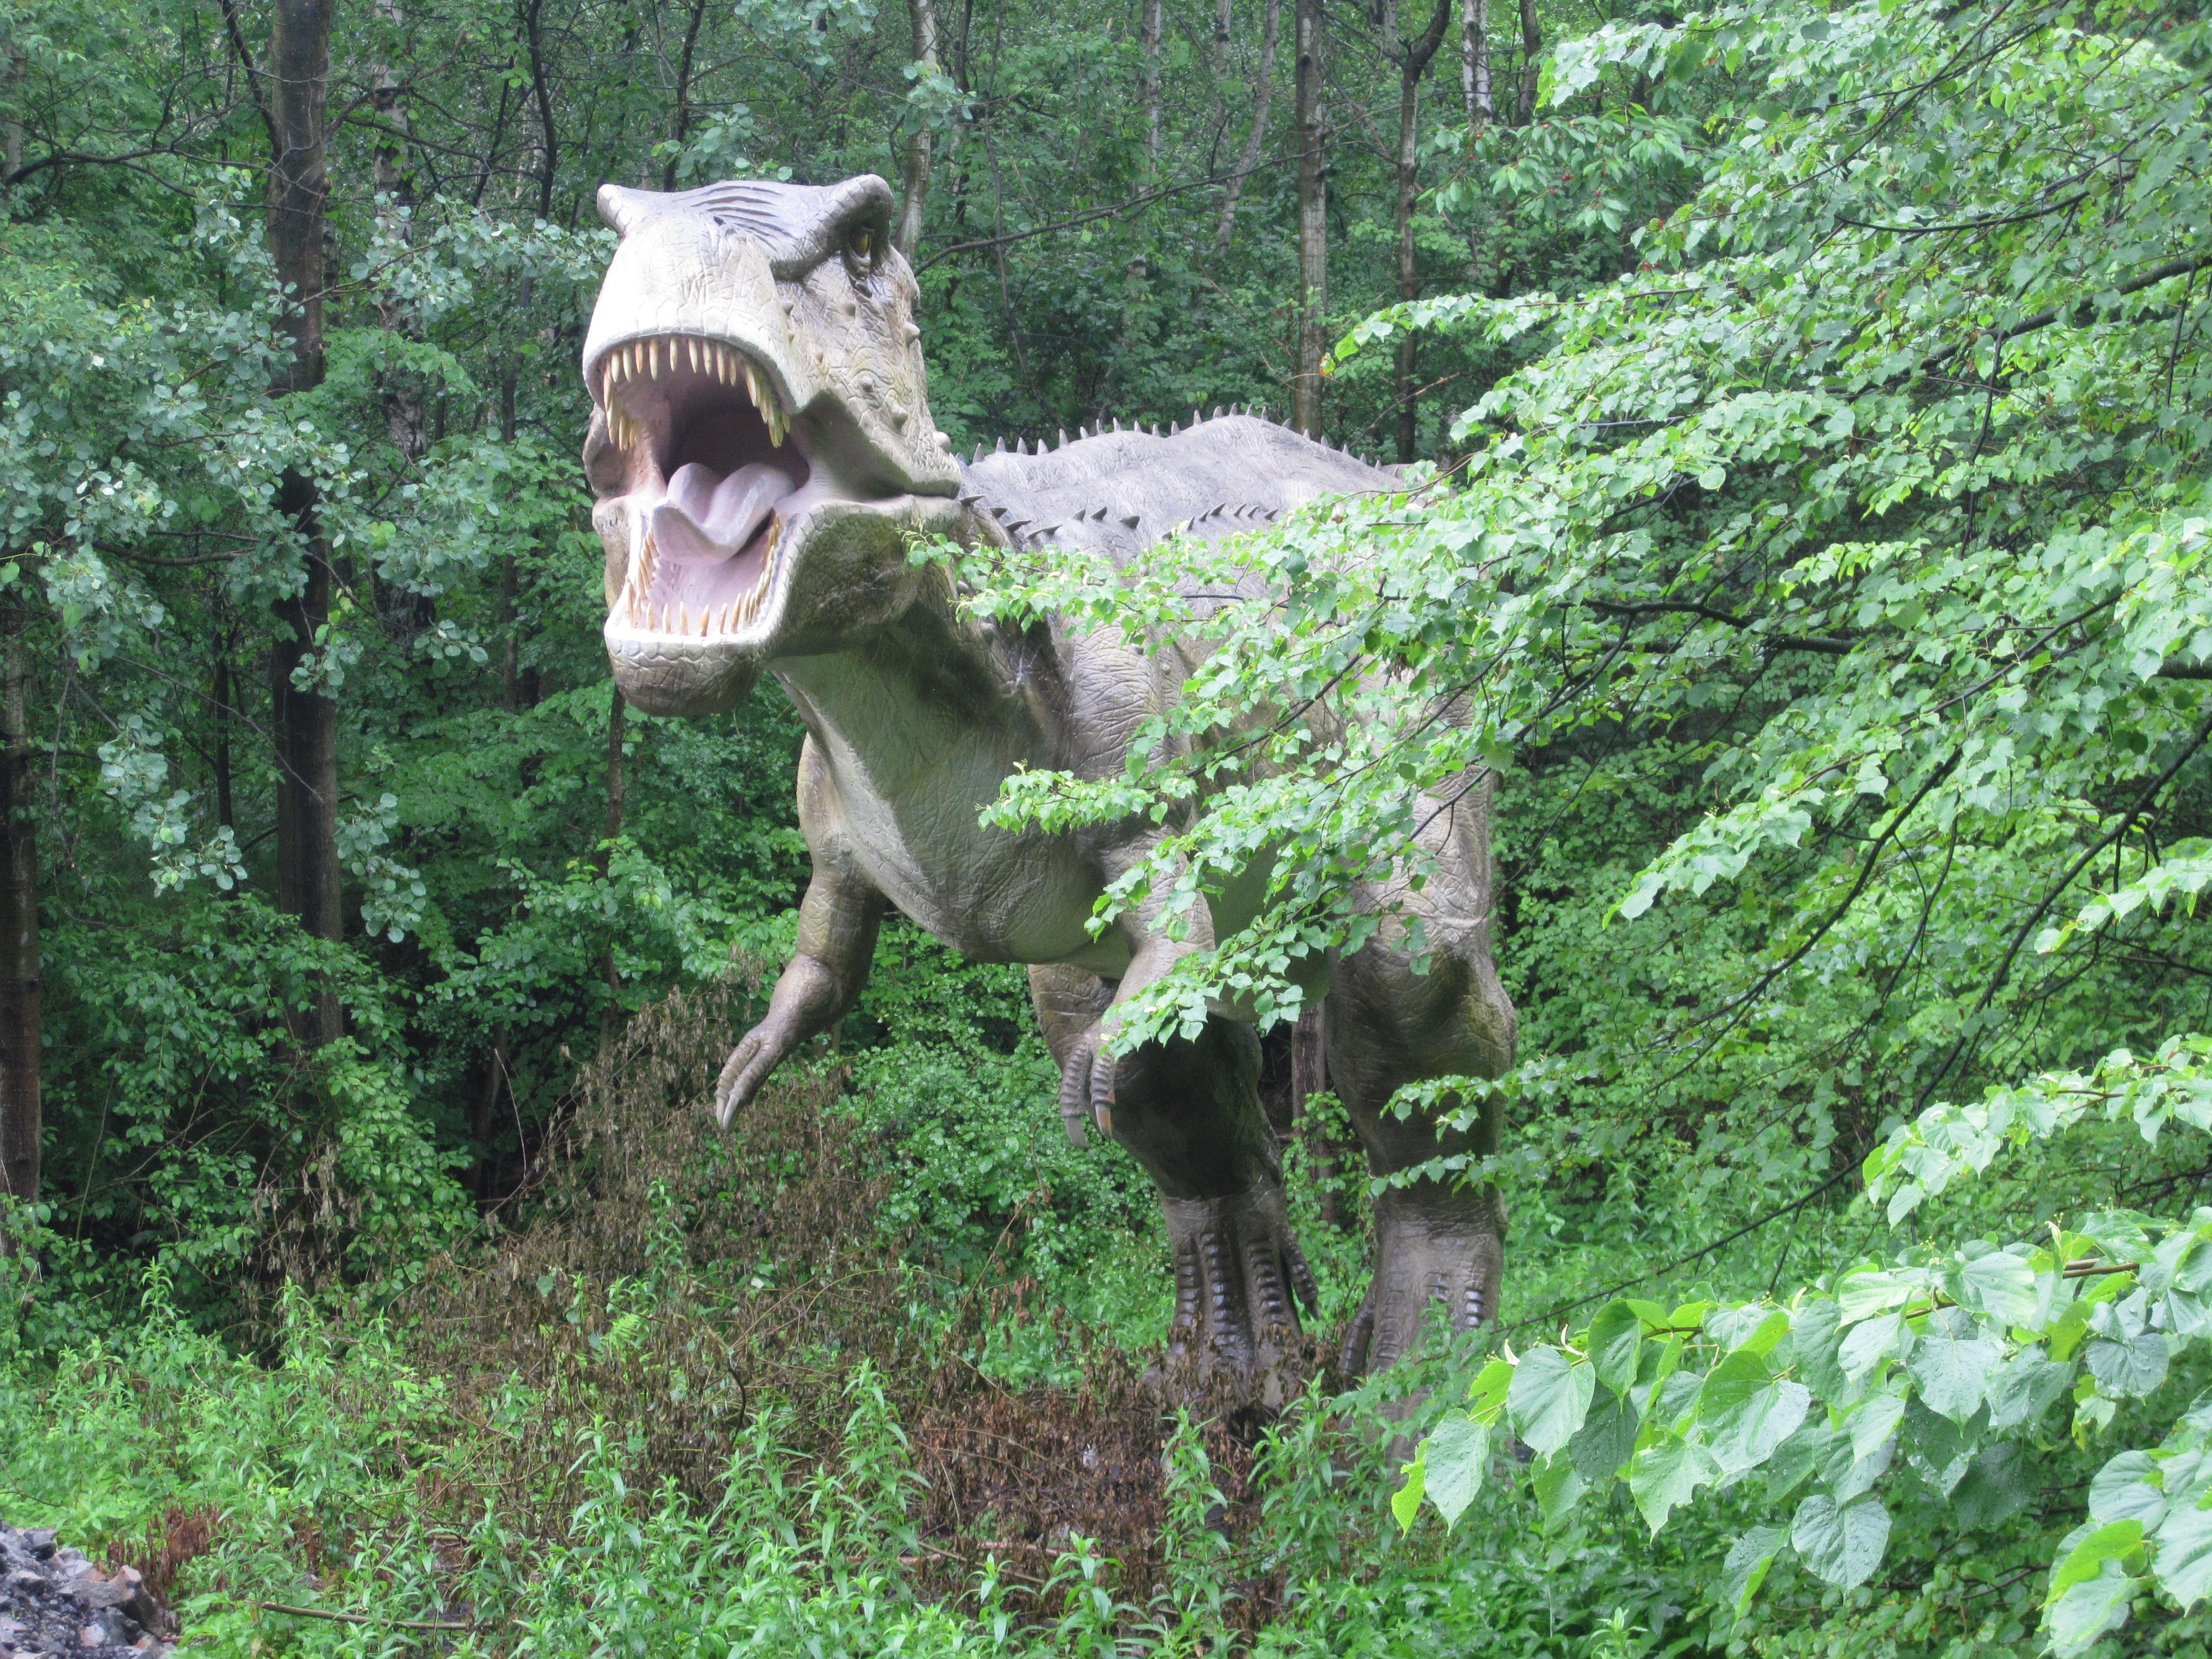 DWD1340 霸王龙 Tyrannosaurus rex